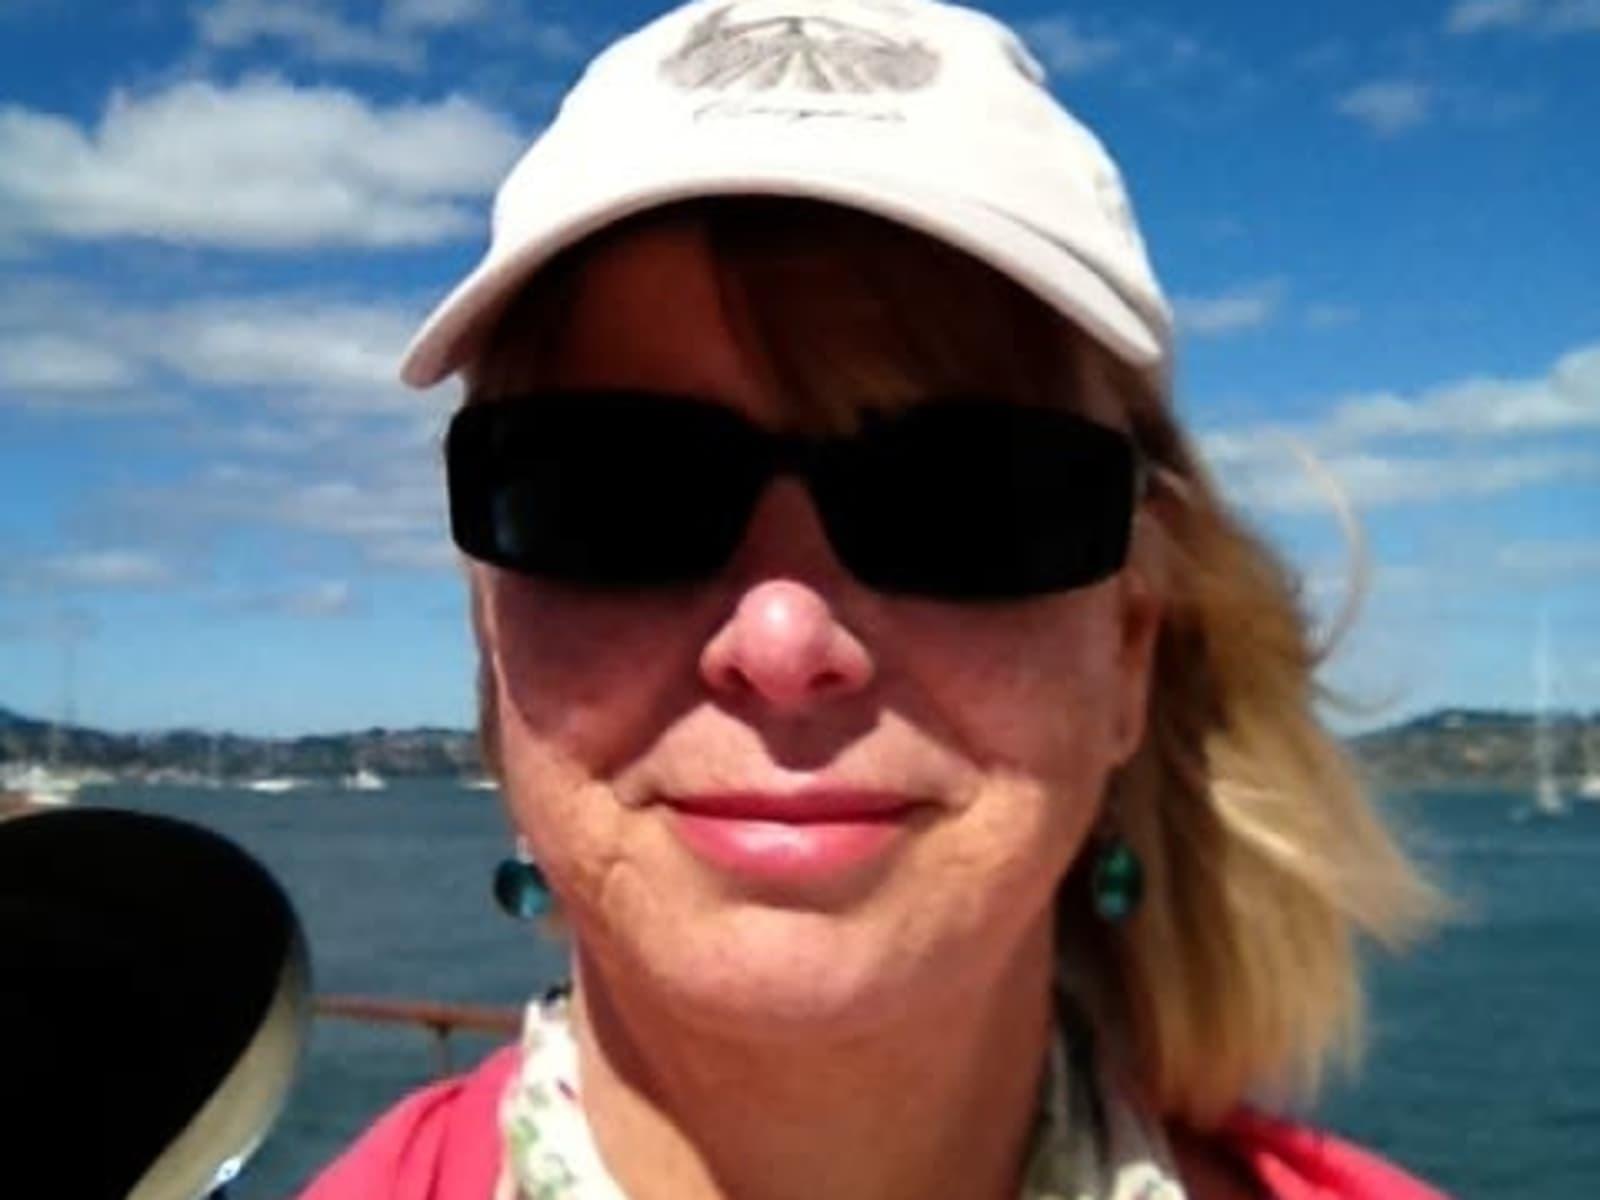 Jeanne from North Saanich, British Columbia, Canada